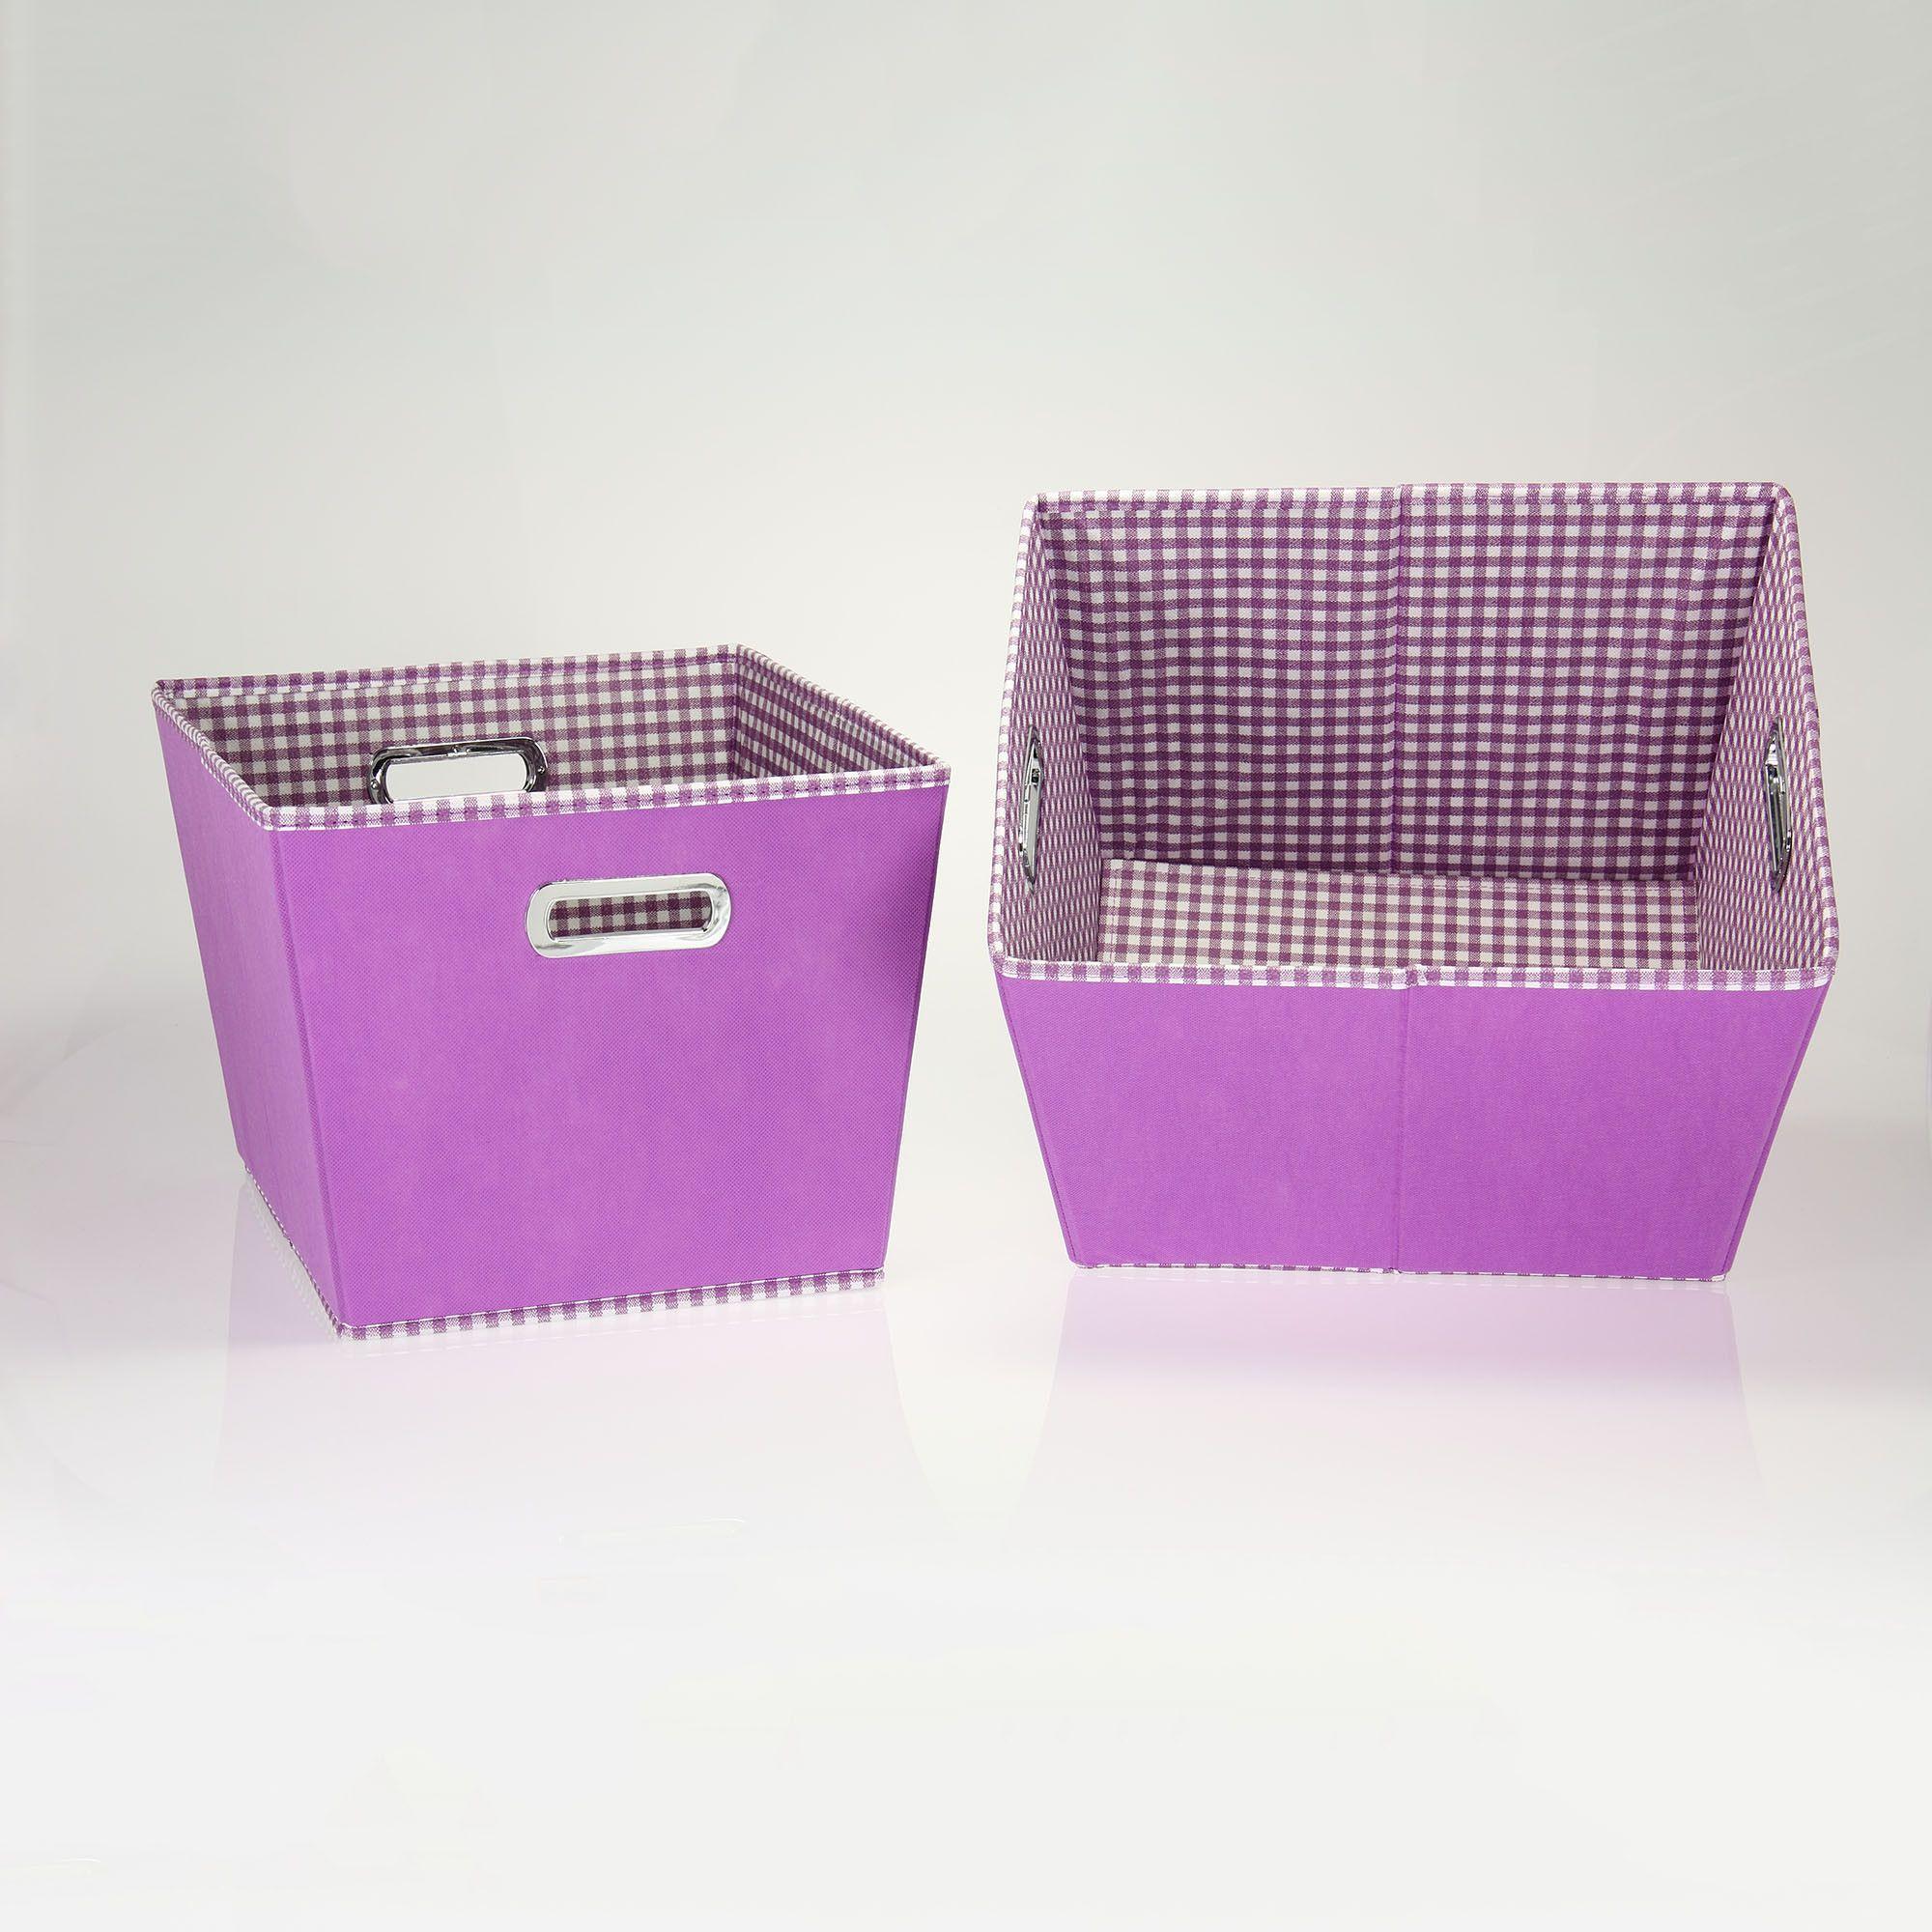 2-Toned Medium Tapered Bins, Purple